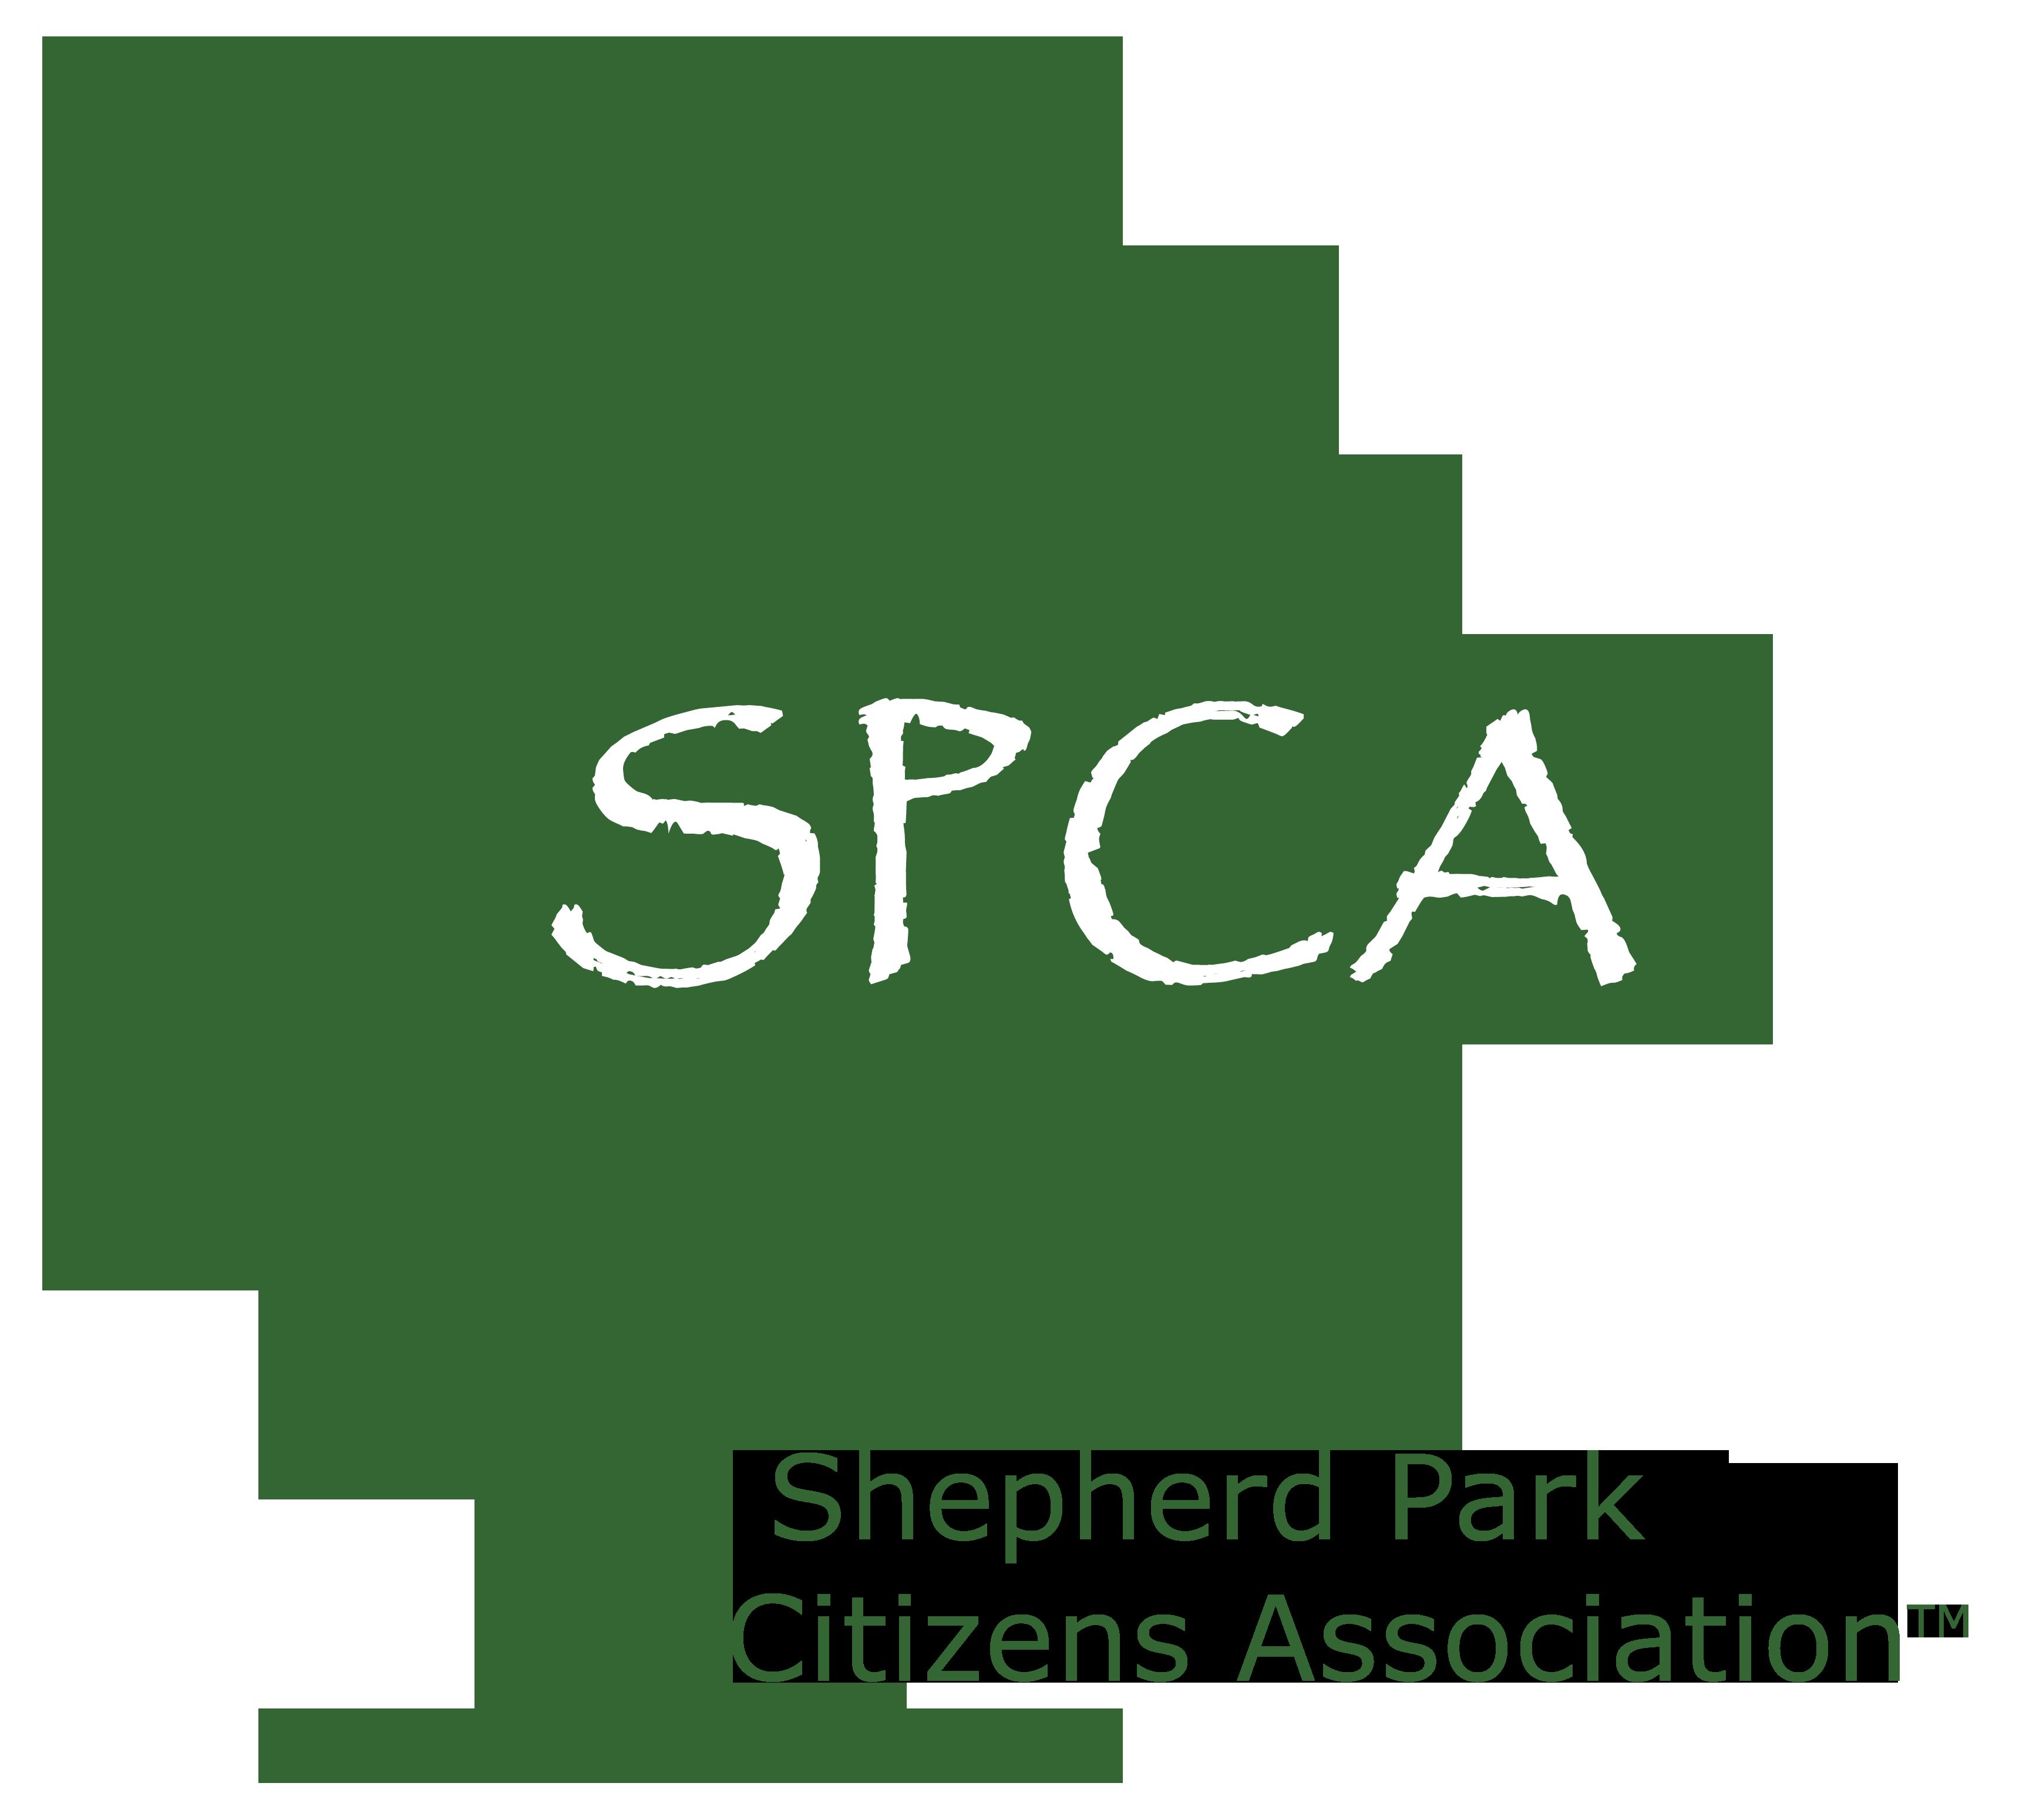 Shepherd Park Citizens Association